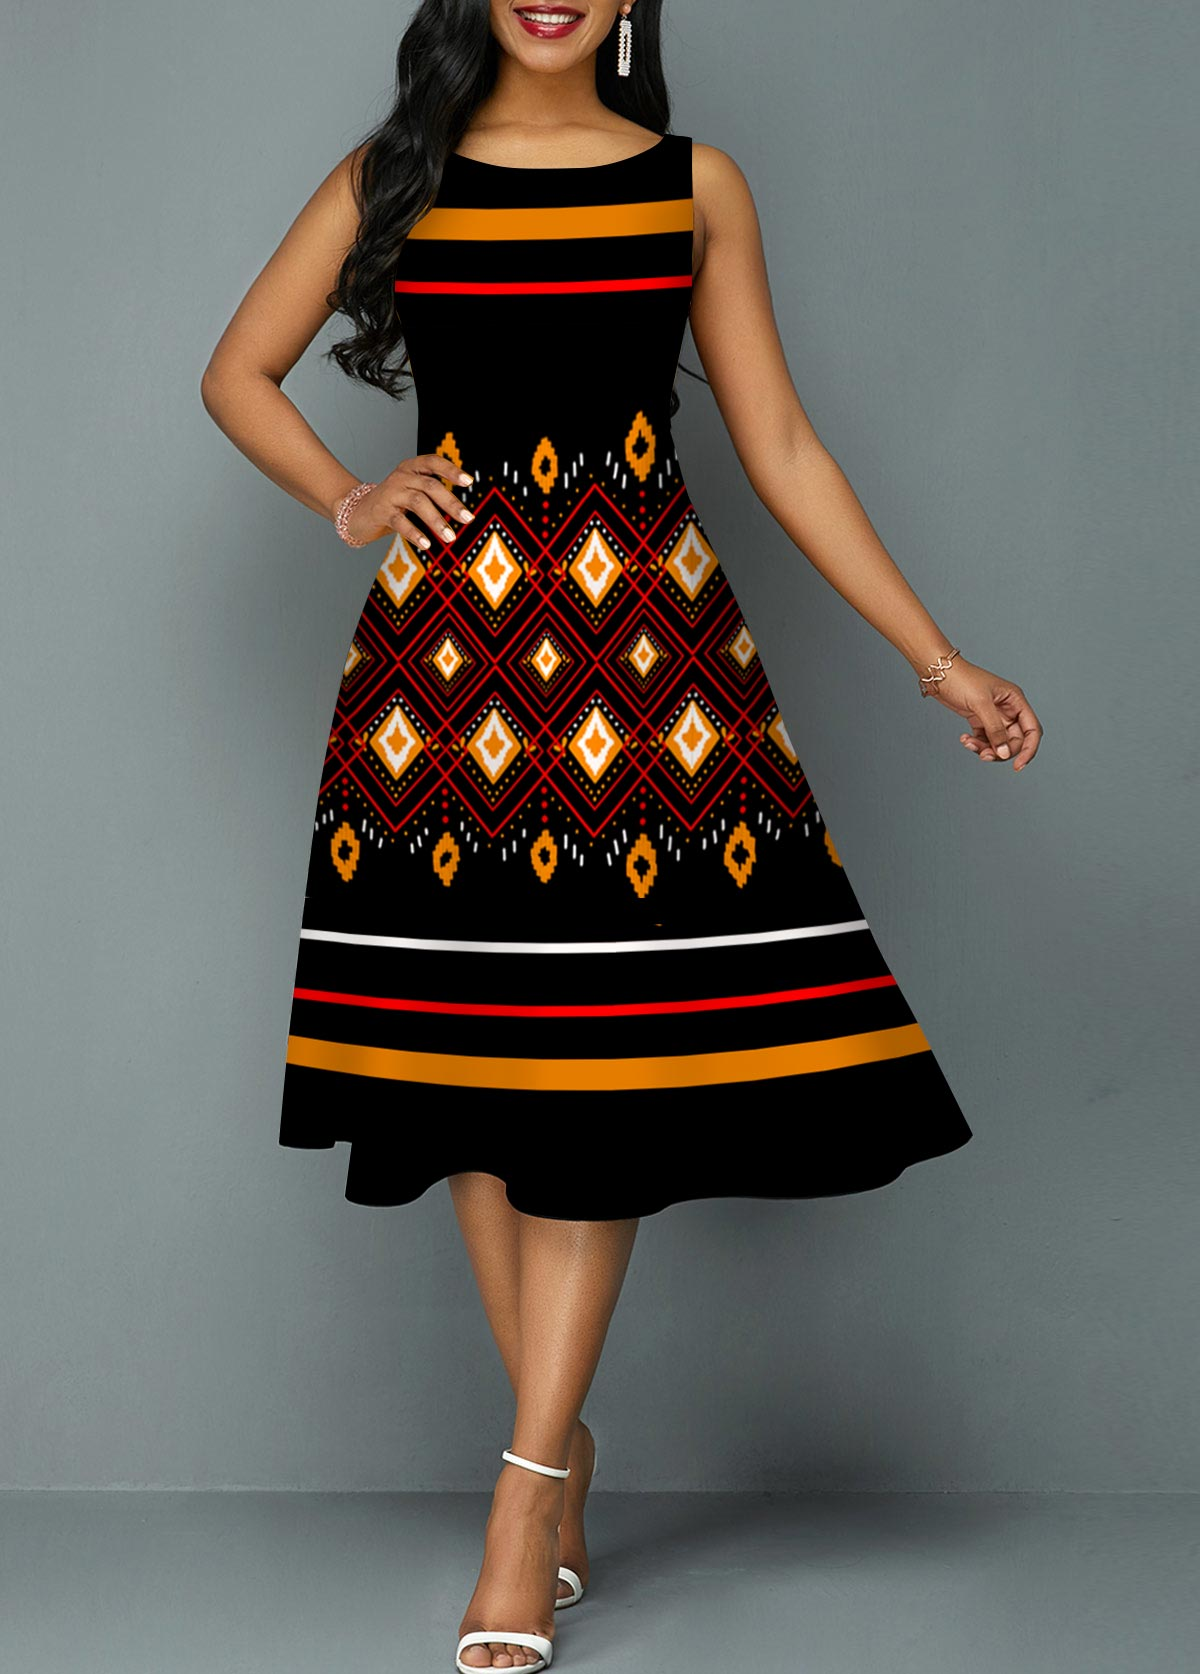 ROTITA Geometric Print Tribal Print Round Neck Sleeveless Dress